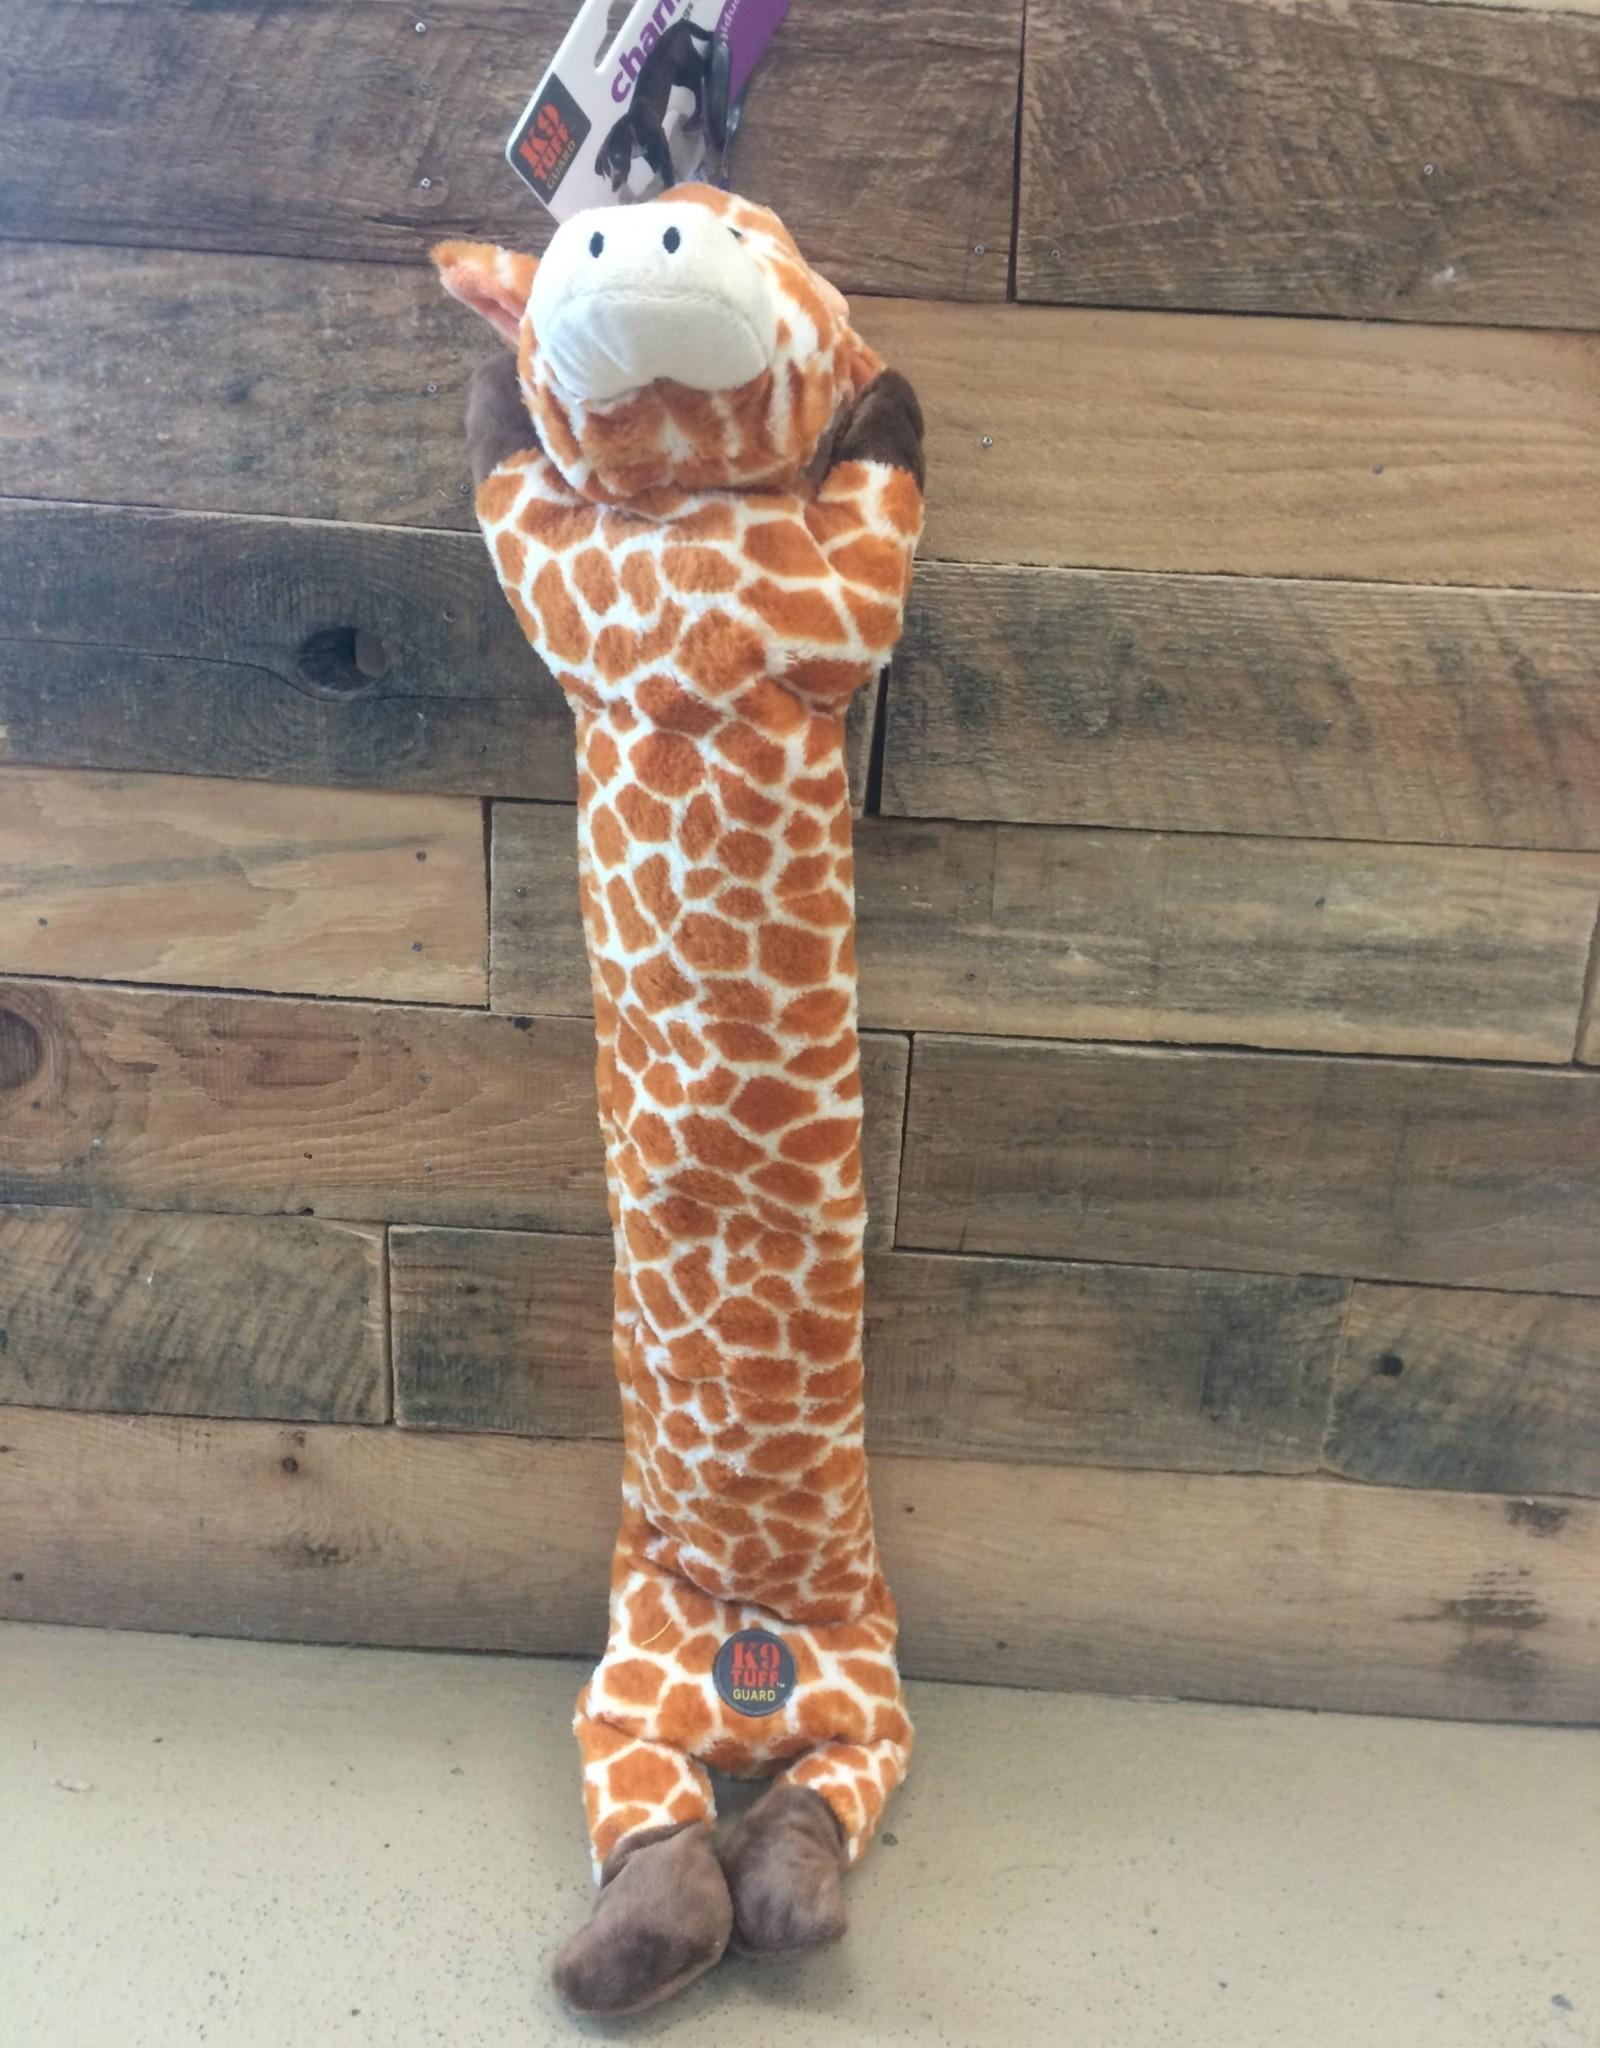 Outward Hound - Charming Pet Charming pet Longidudes Giraffe